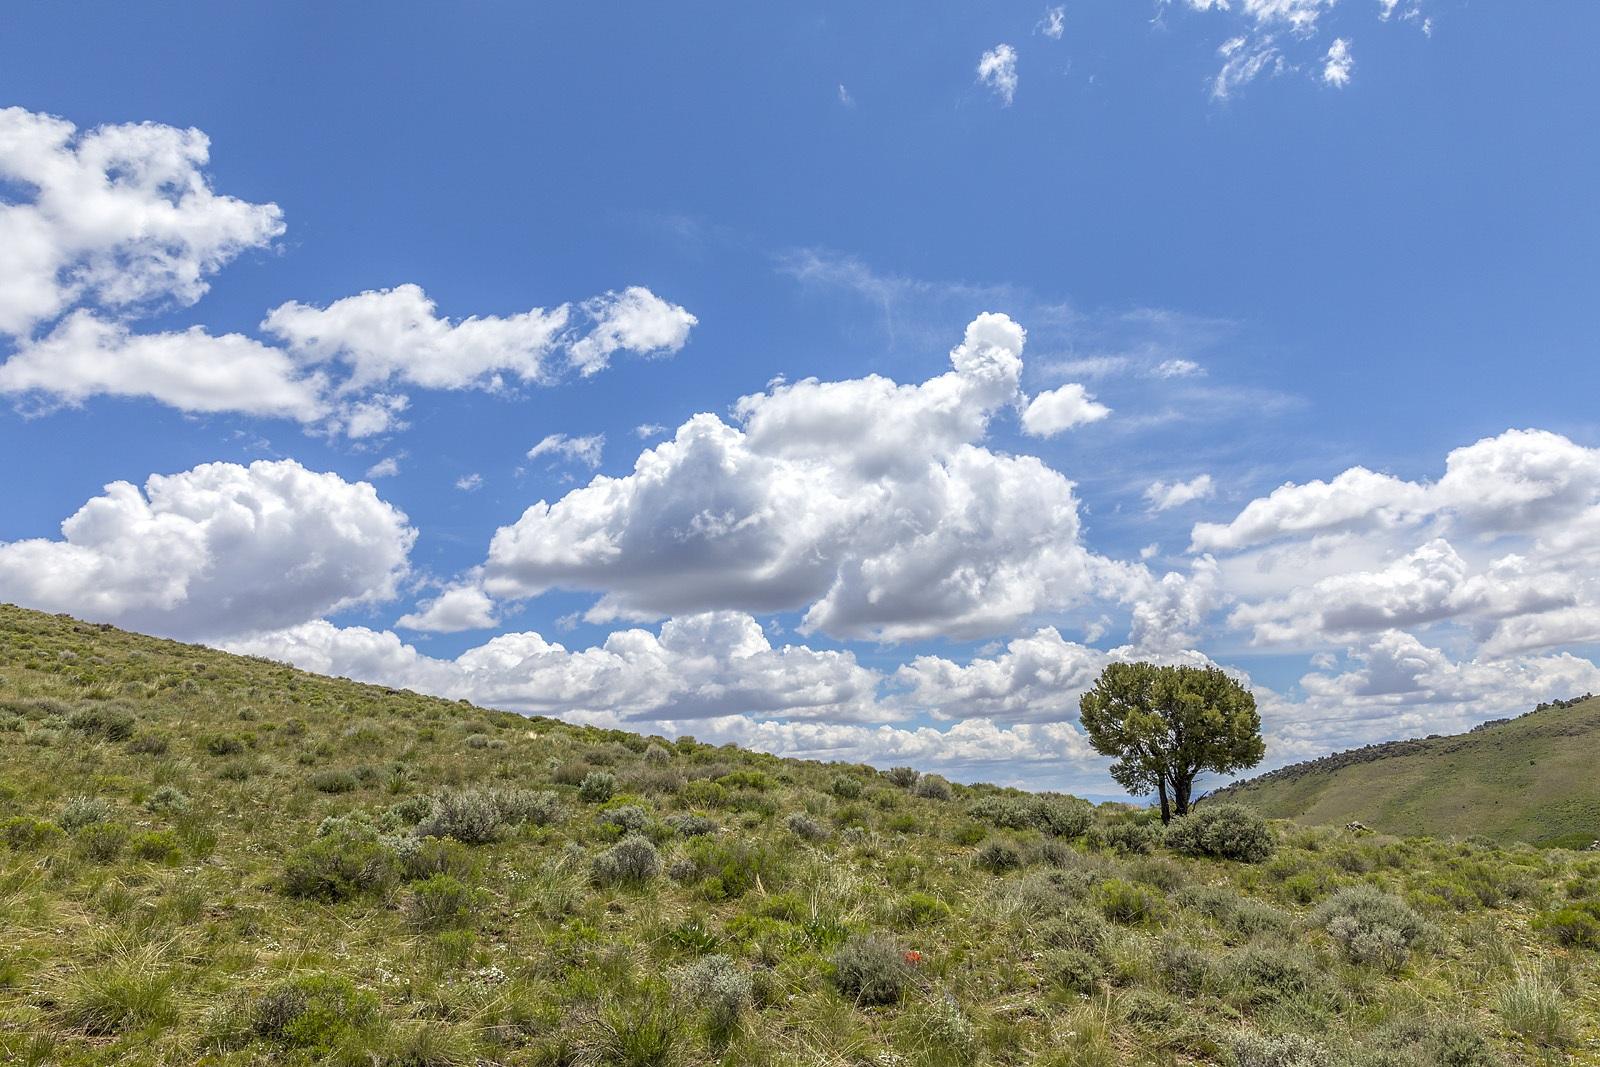 Nevada Scenic Landscape MG 3599 v2 Pancake Summit Vcnty Hwy 50